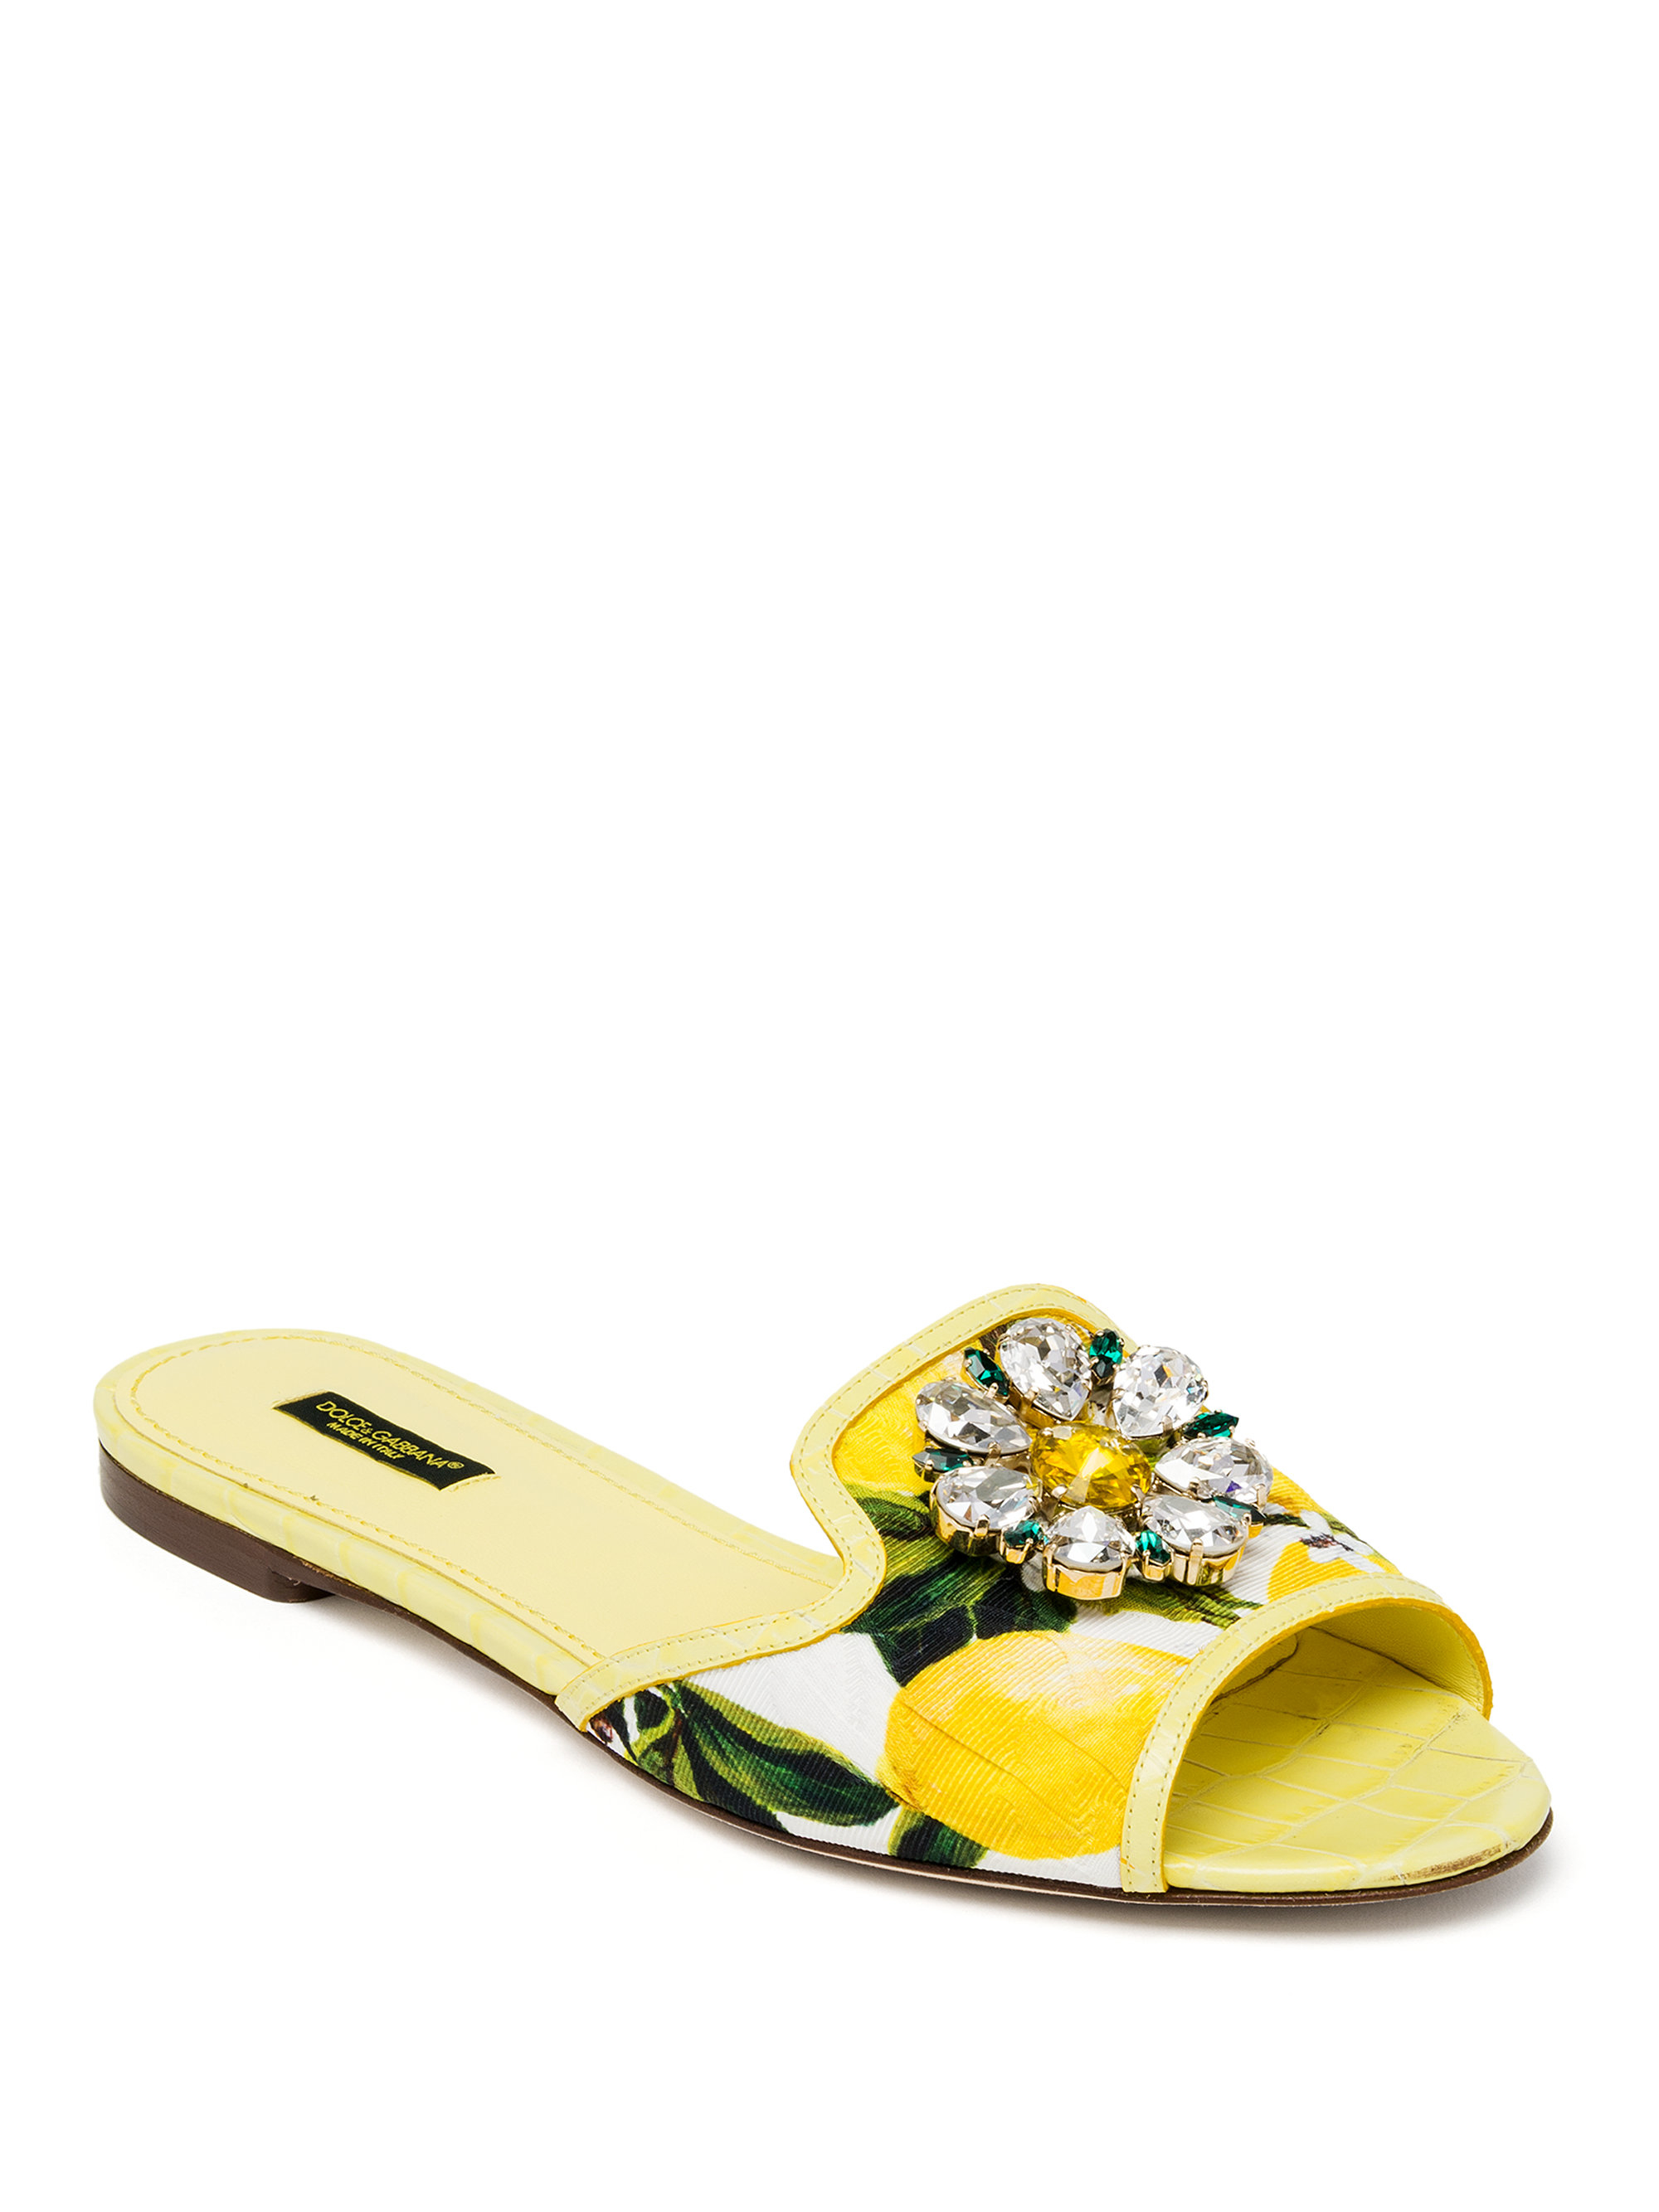 Dolce & Gabbana Sandales 5nP0J